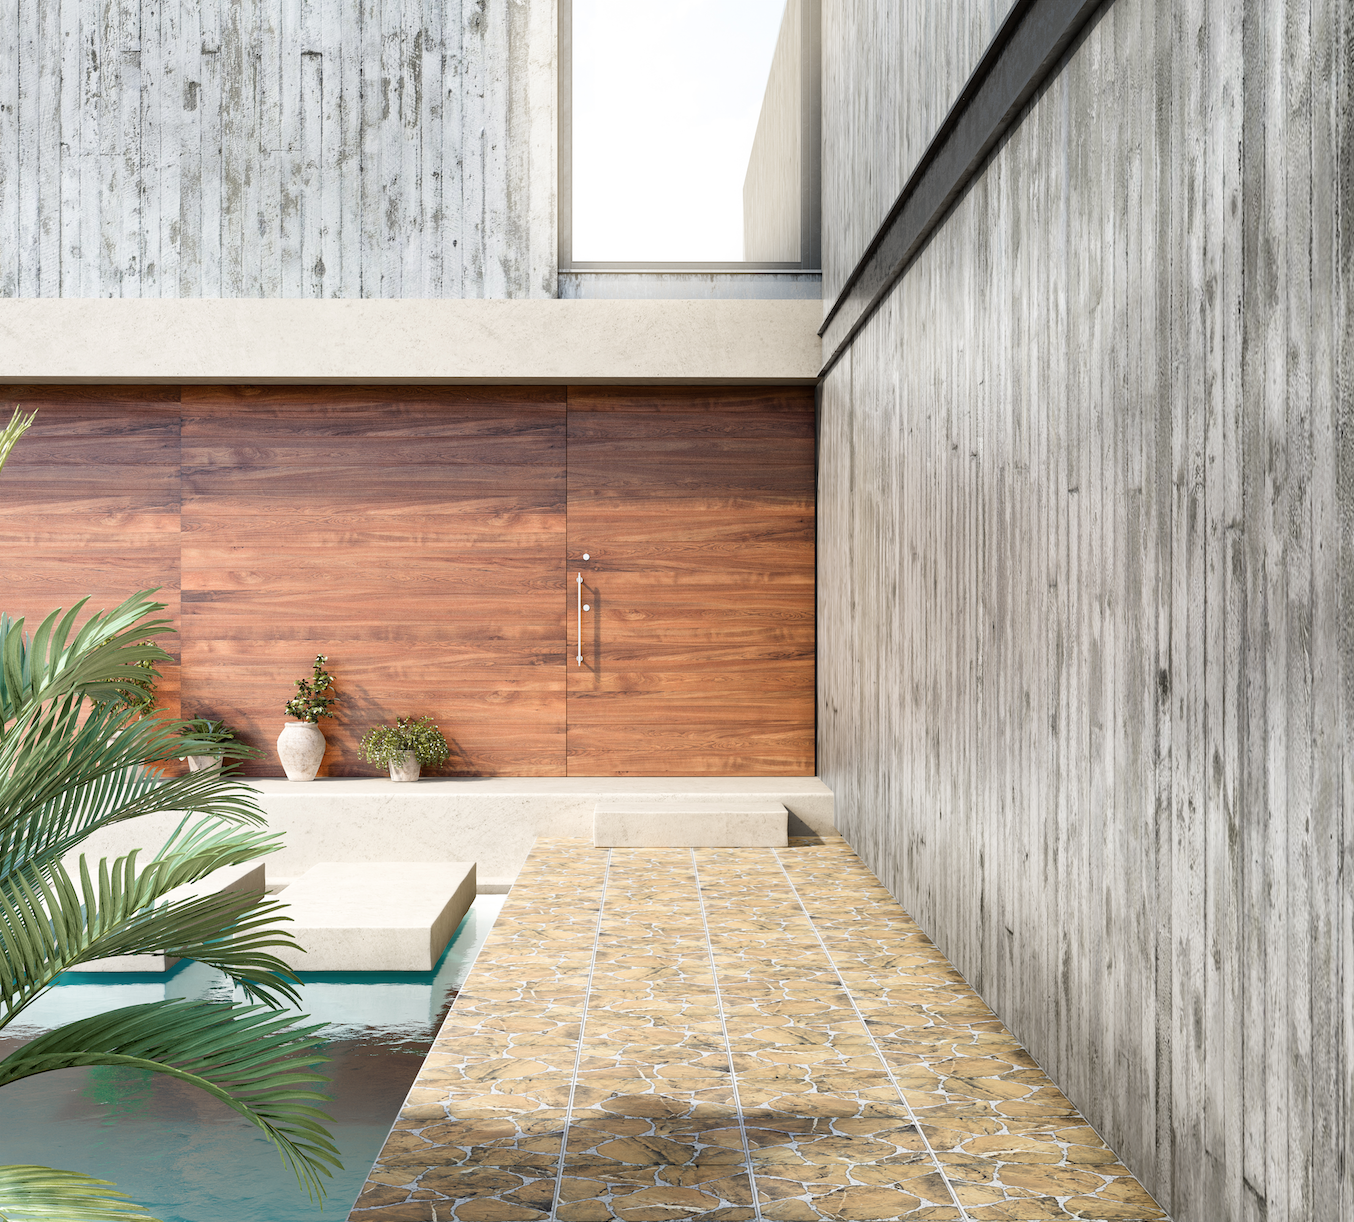 Piso pinar 45x45 caf daltile pisos pisos for Pisos exteriores